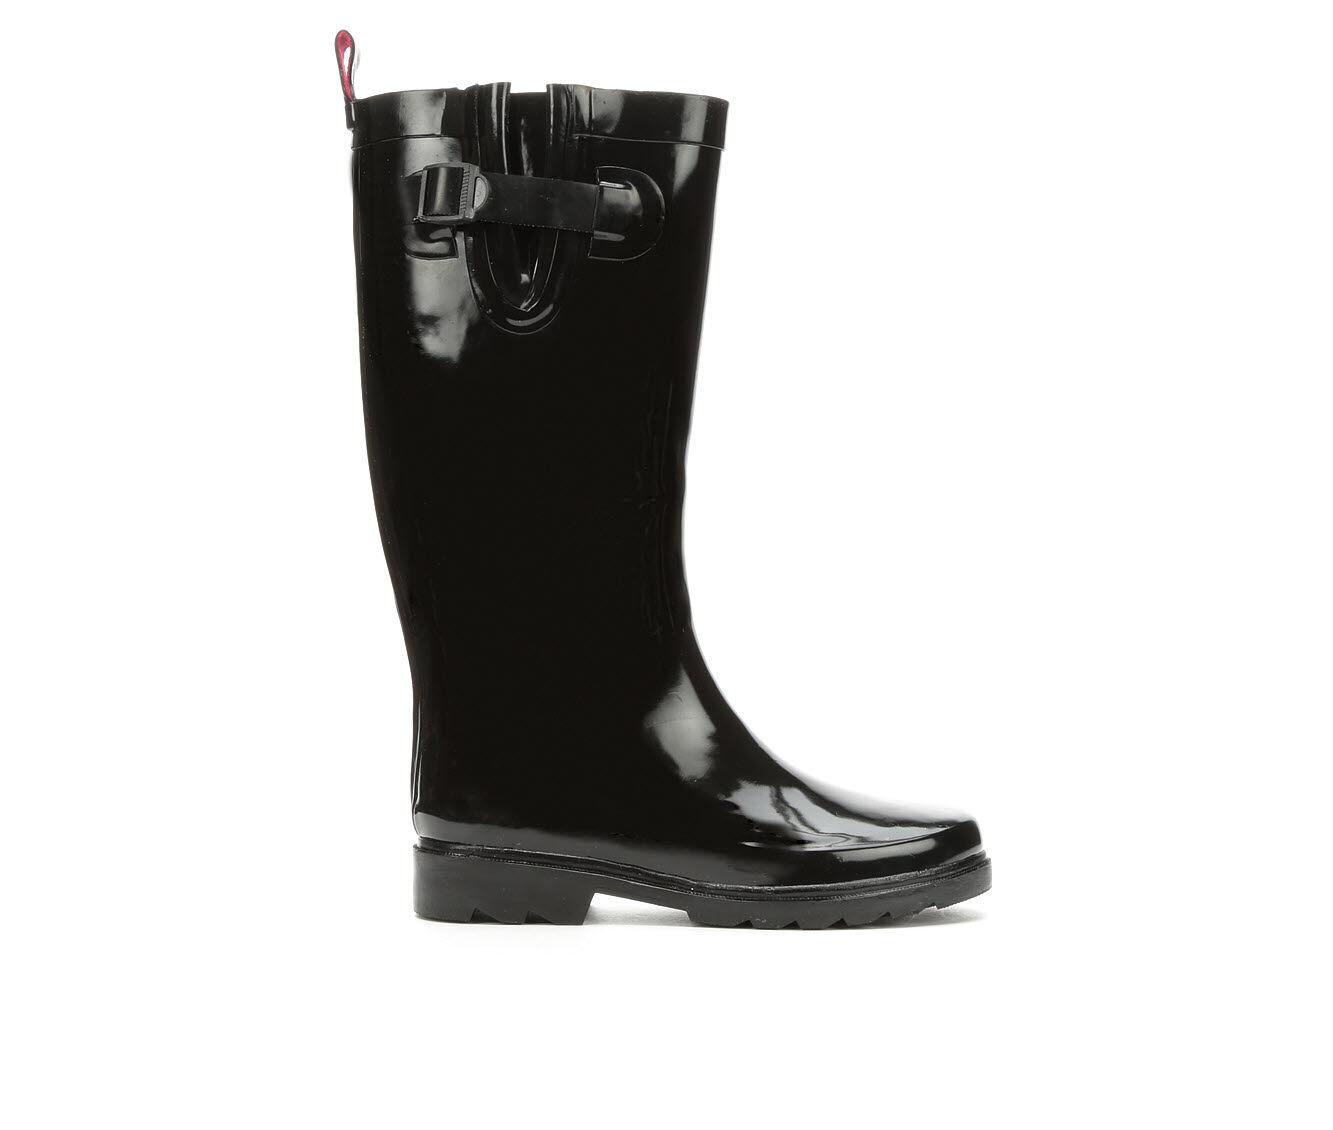 Women's Capelli New York Shiny Solid Tall Rain Boots Black